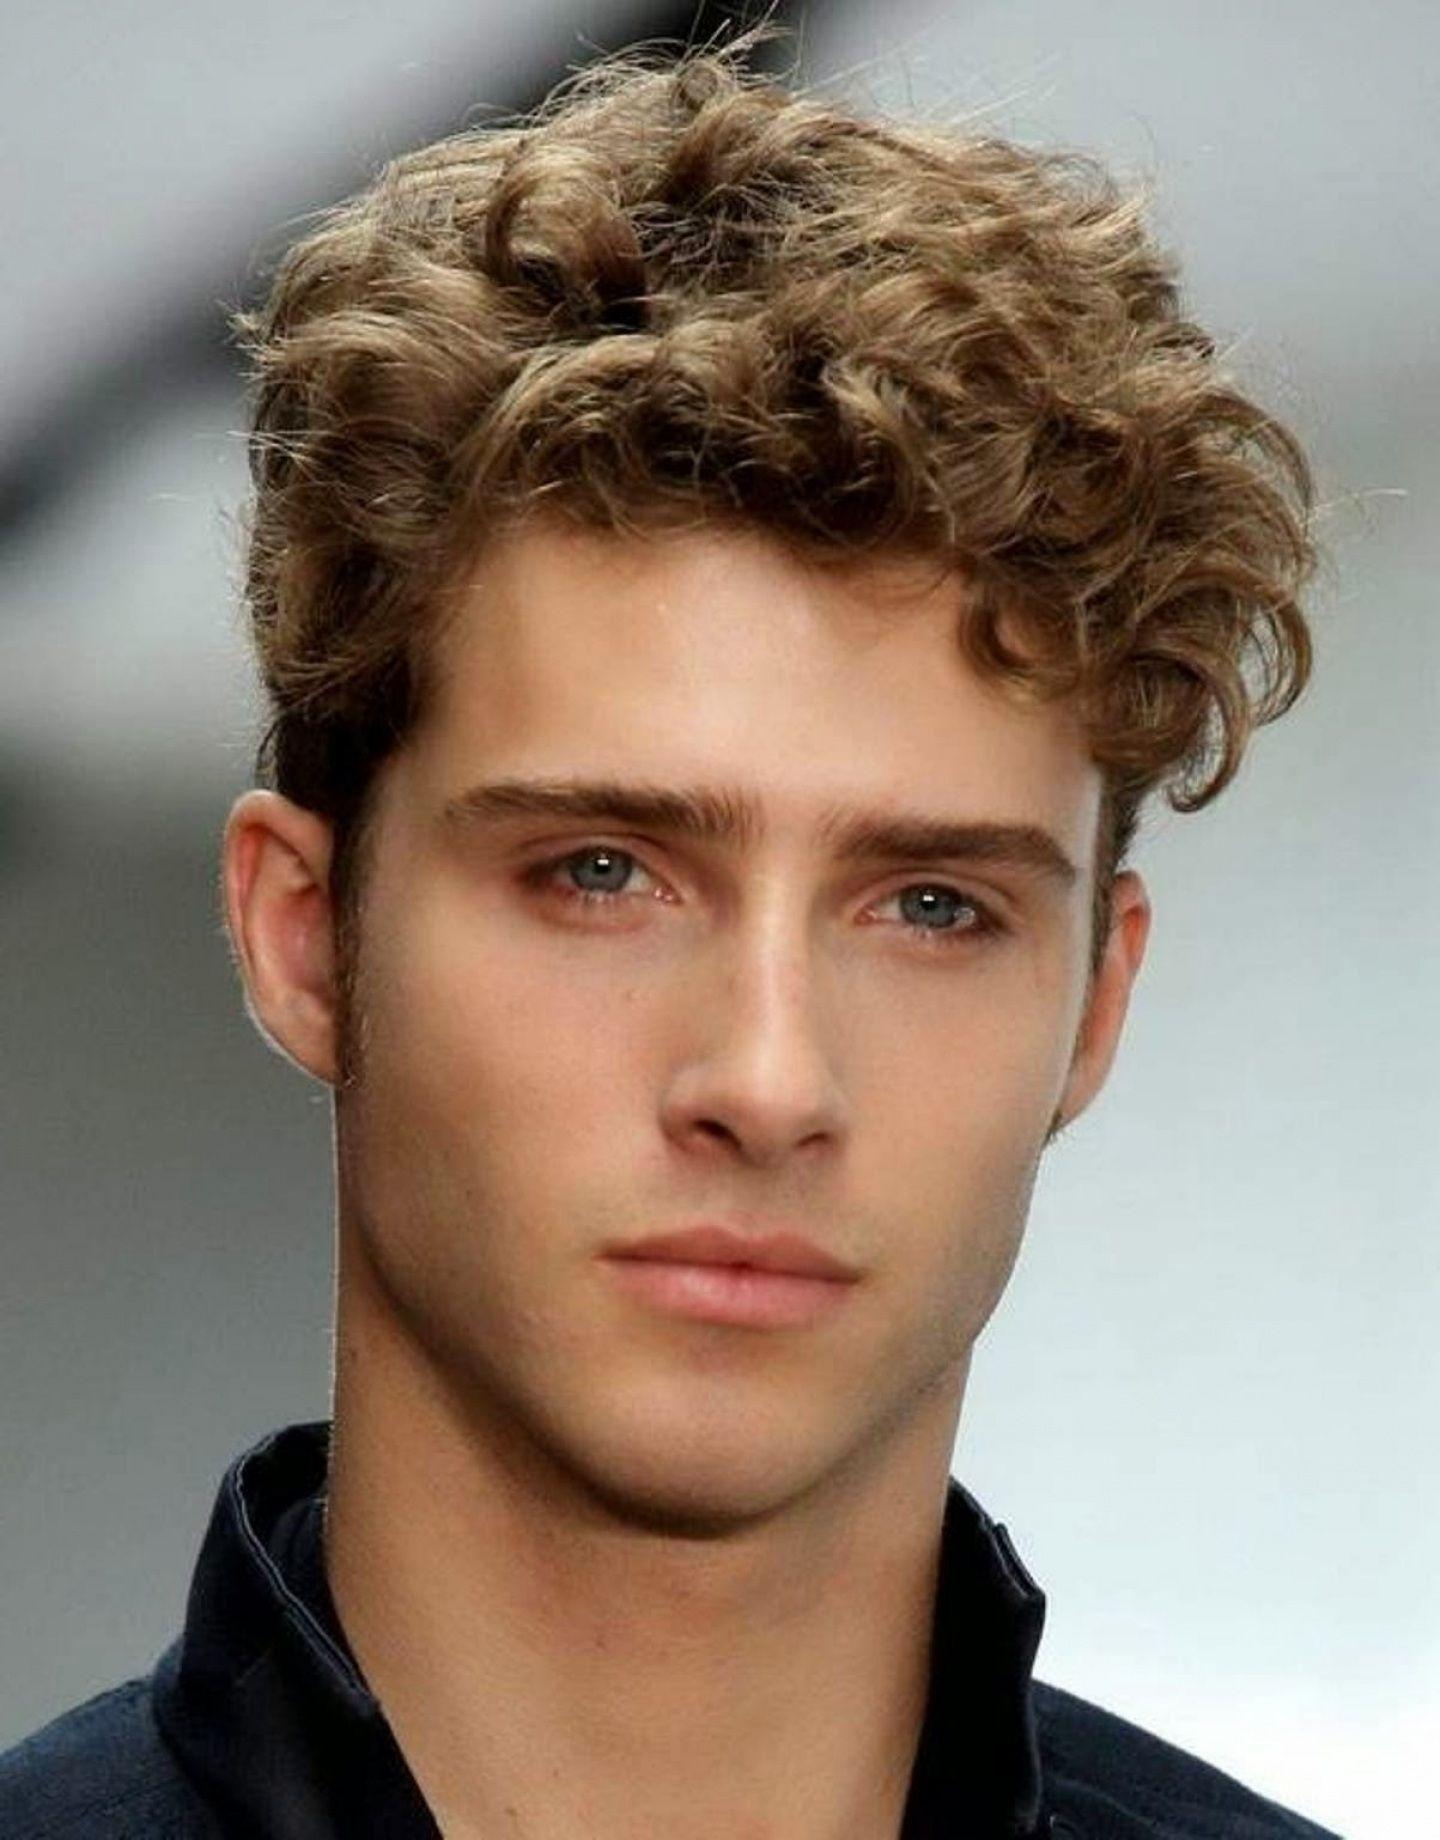 Short Haircuts for Men with Curly Hair Darien haircut